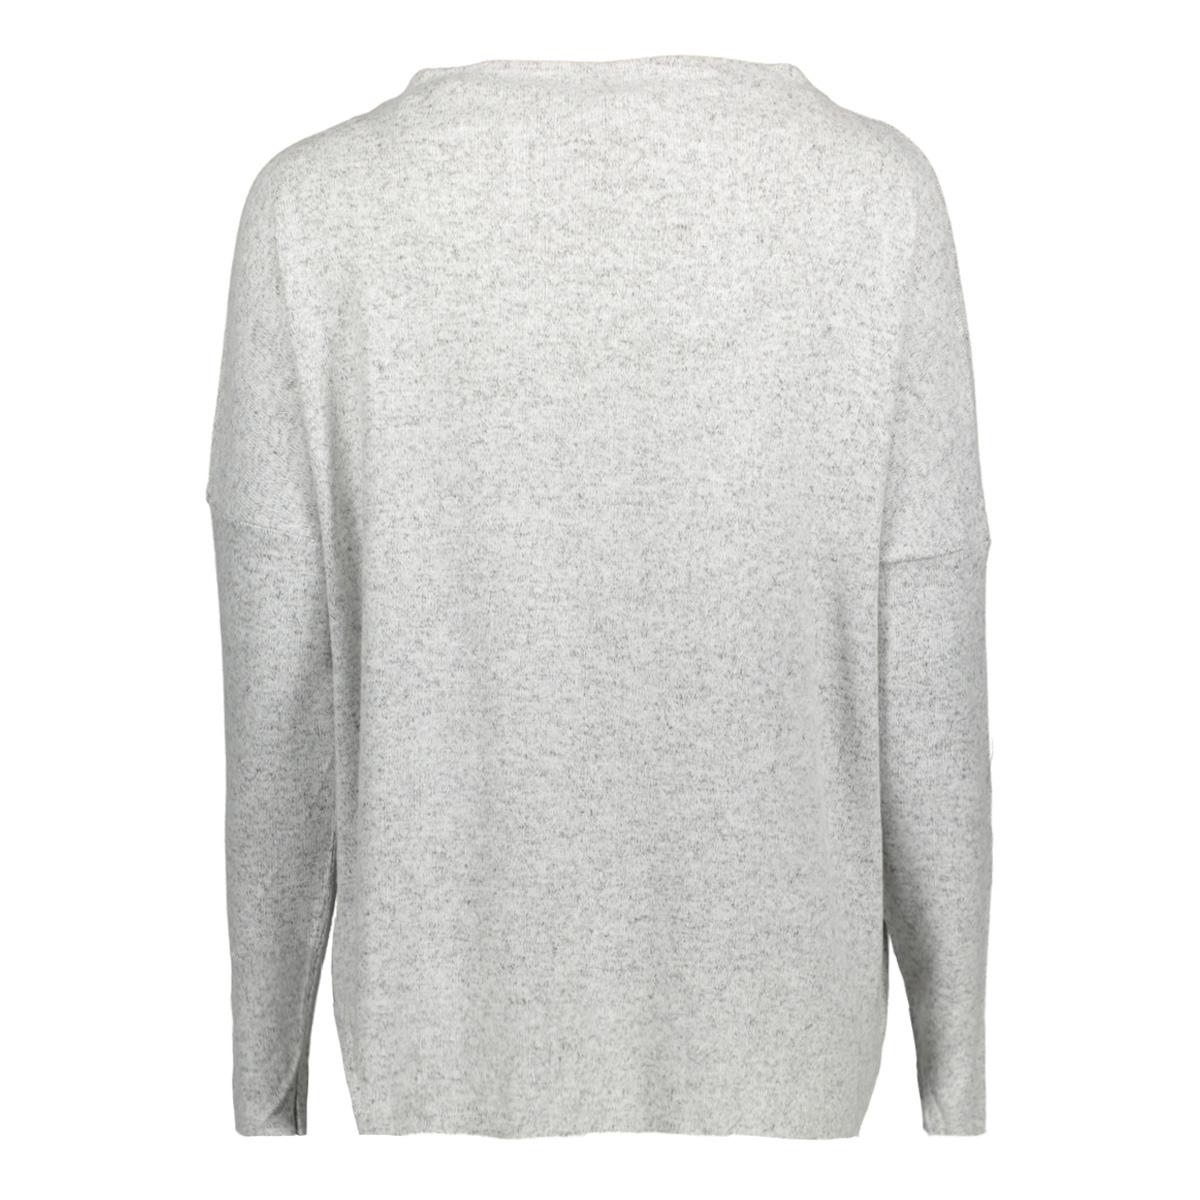 onlkleo l/s plain pullover knt noos 15141720 only trui light grey melange